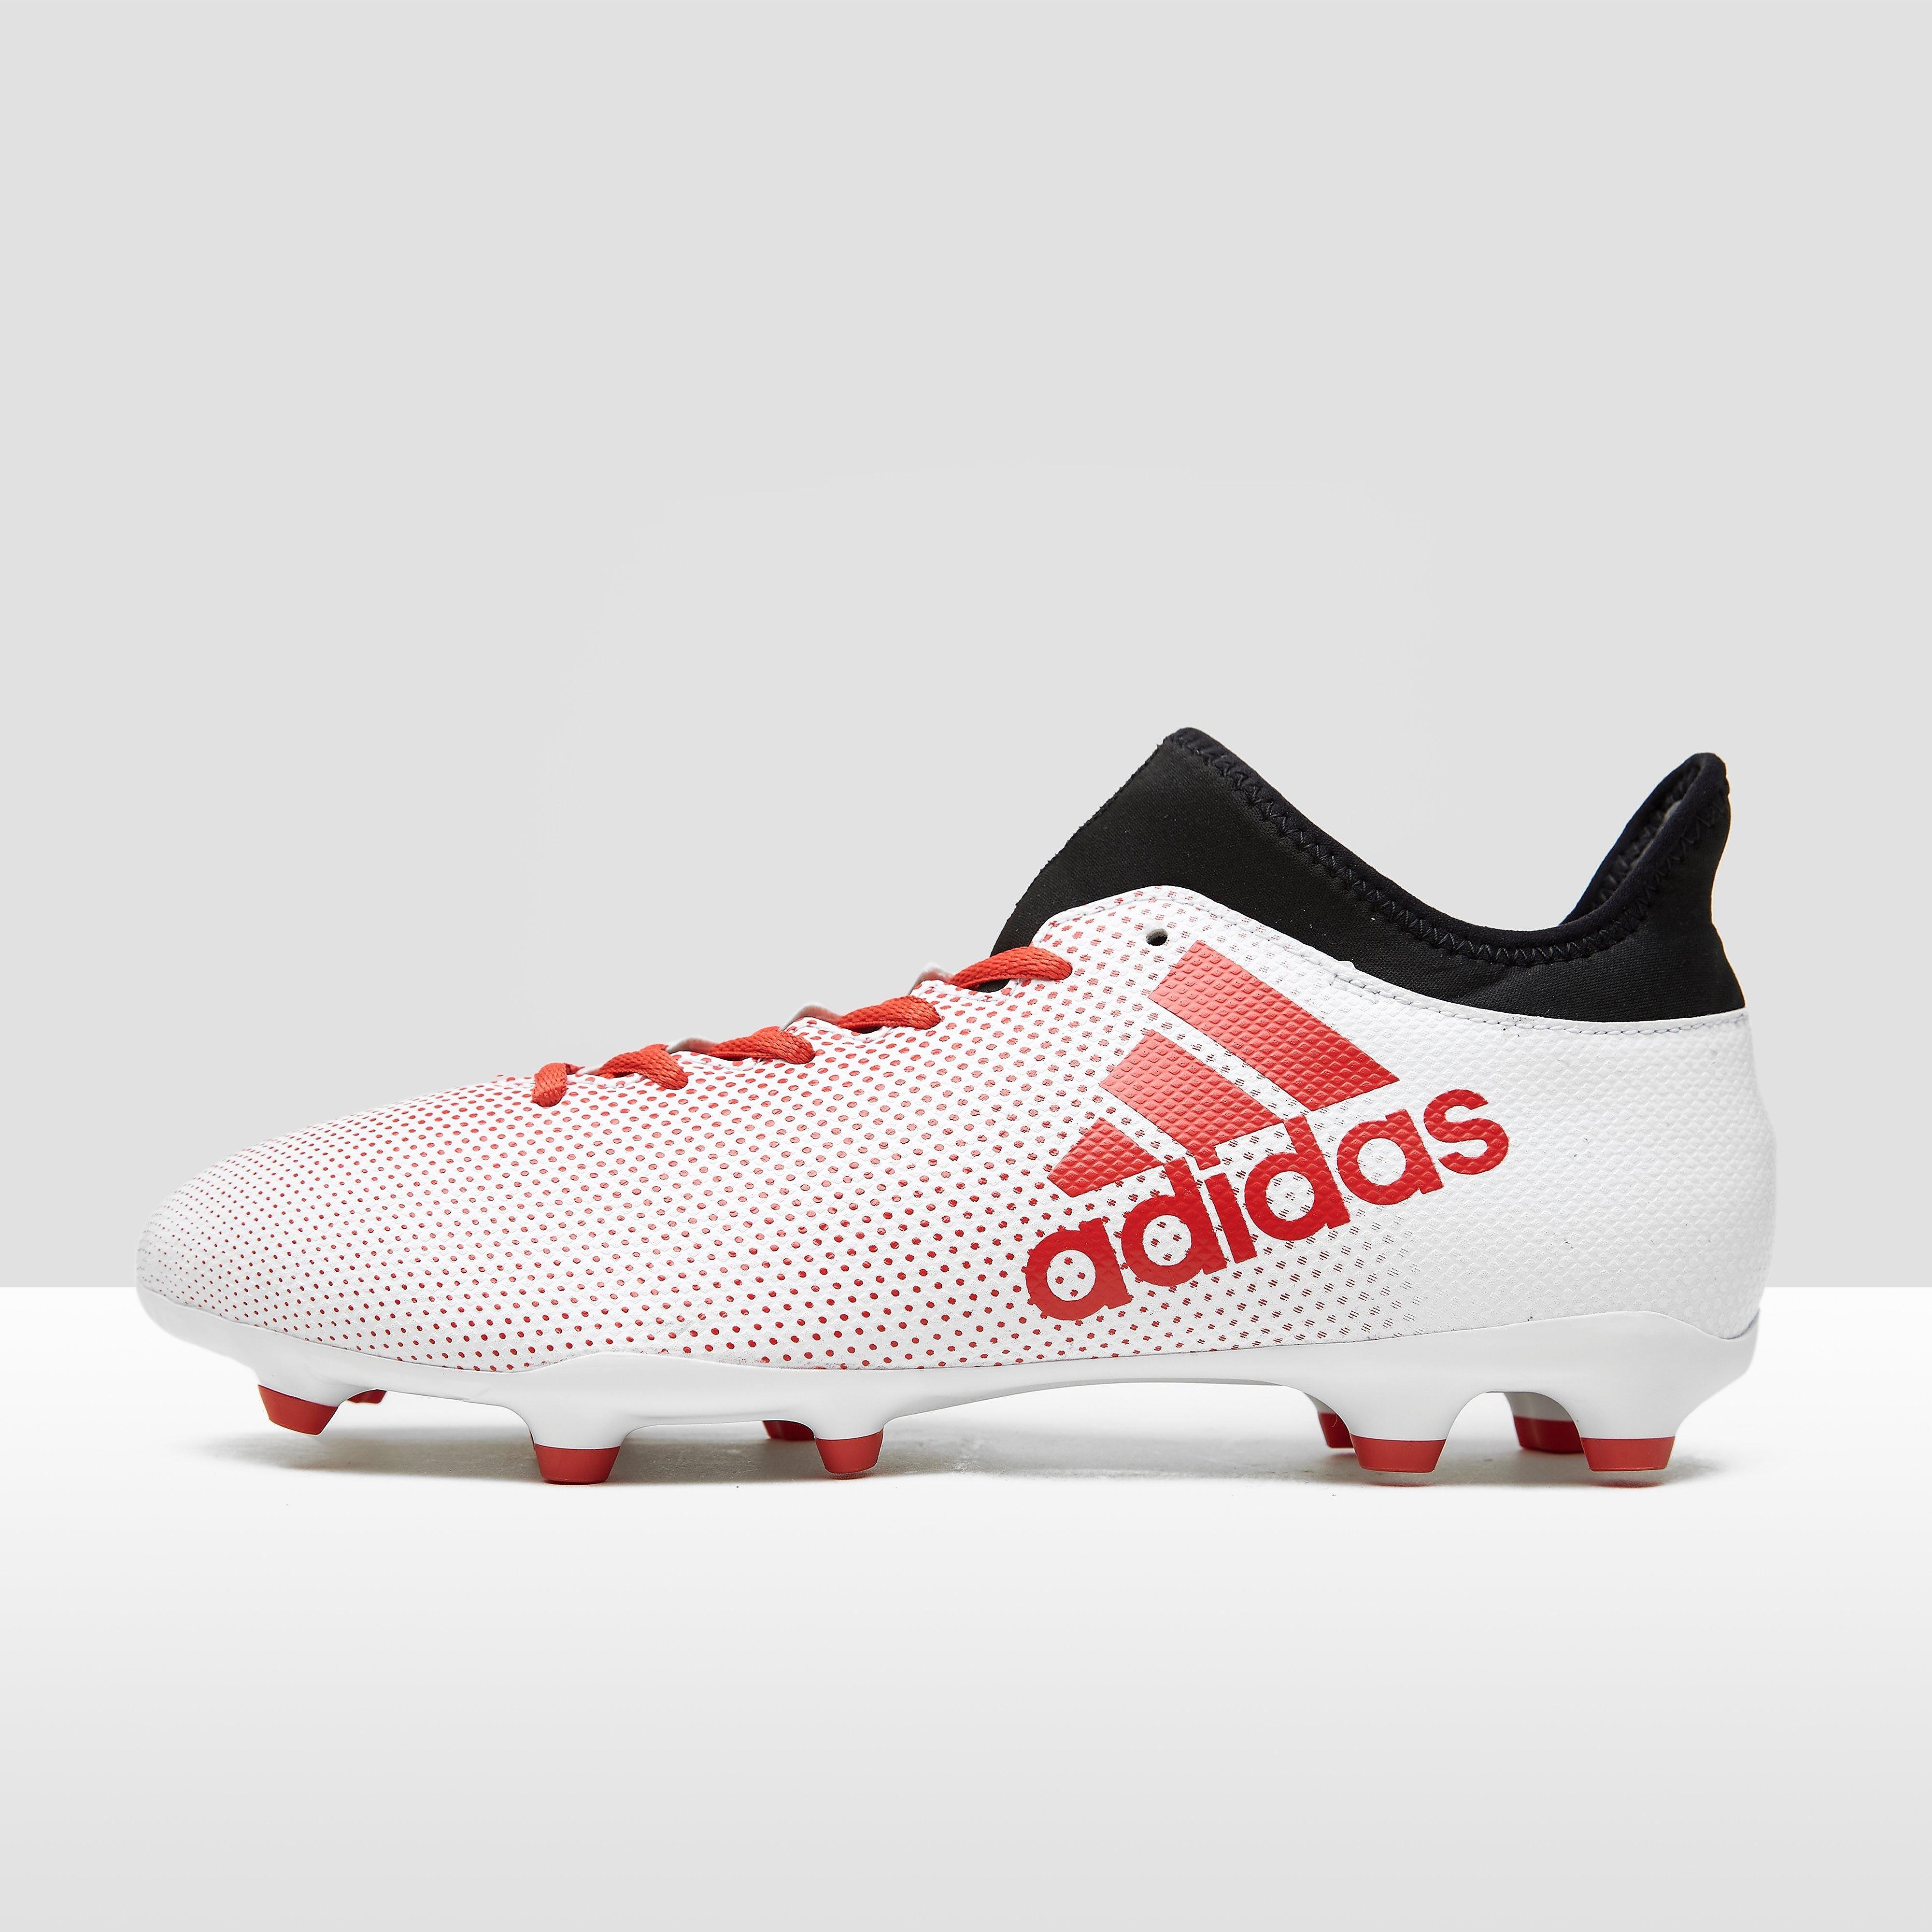 Womens X 17.3 Fg Voetbalschoenen Wit-Rood Heren. Size 45